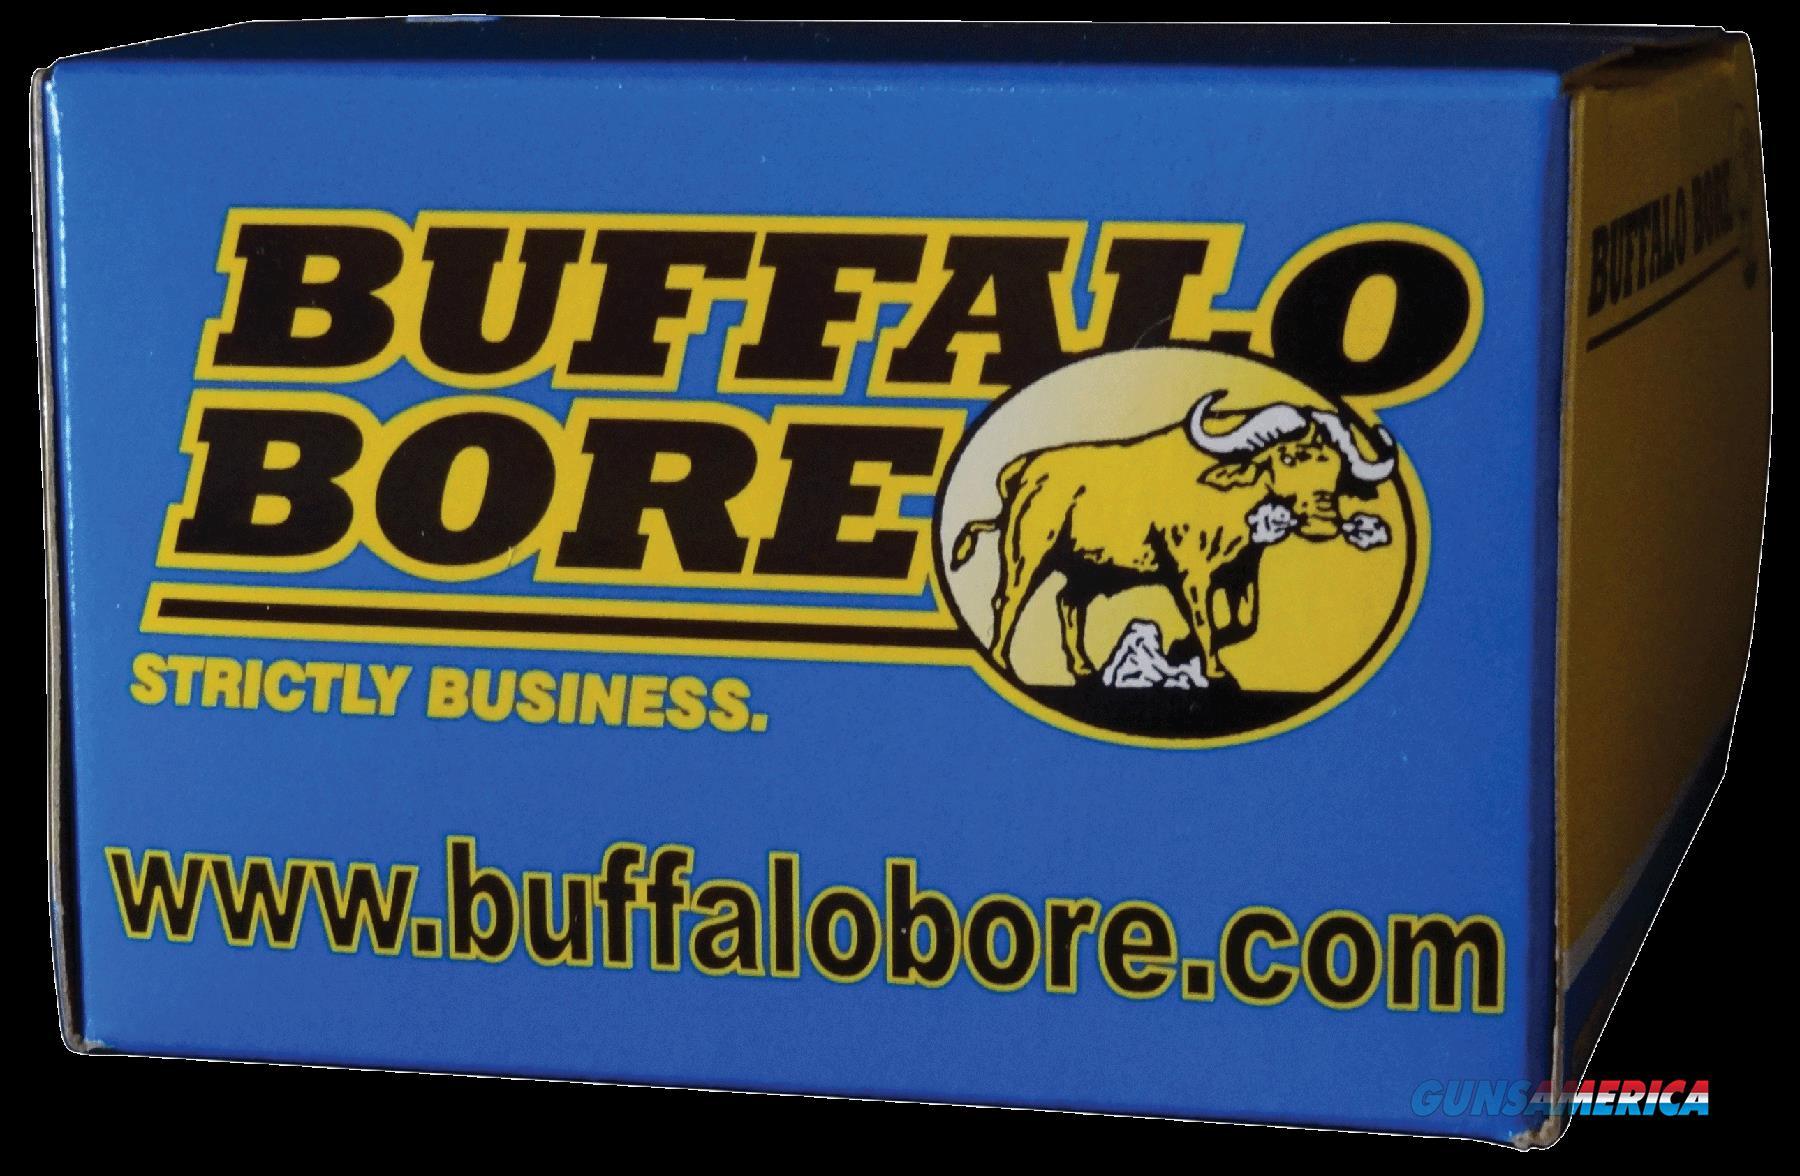 Buffalo Bore Ammunition Heavy, Bba 9b-20 444mar 300g Jfn        20-12  Guns > Pistols > 1911 Pistol Copies (non-Colt)